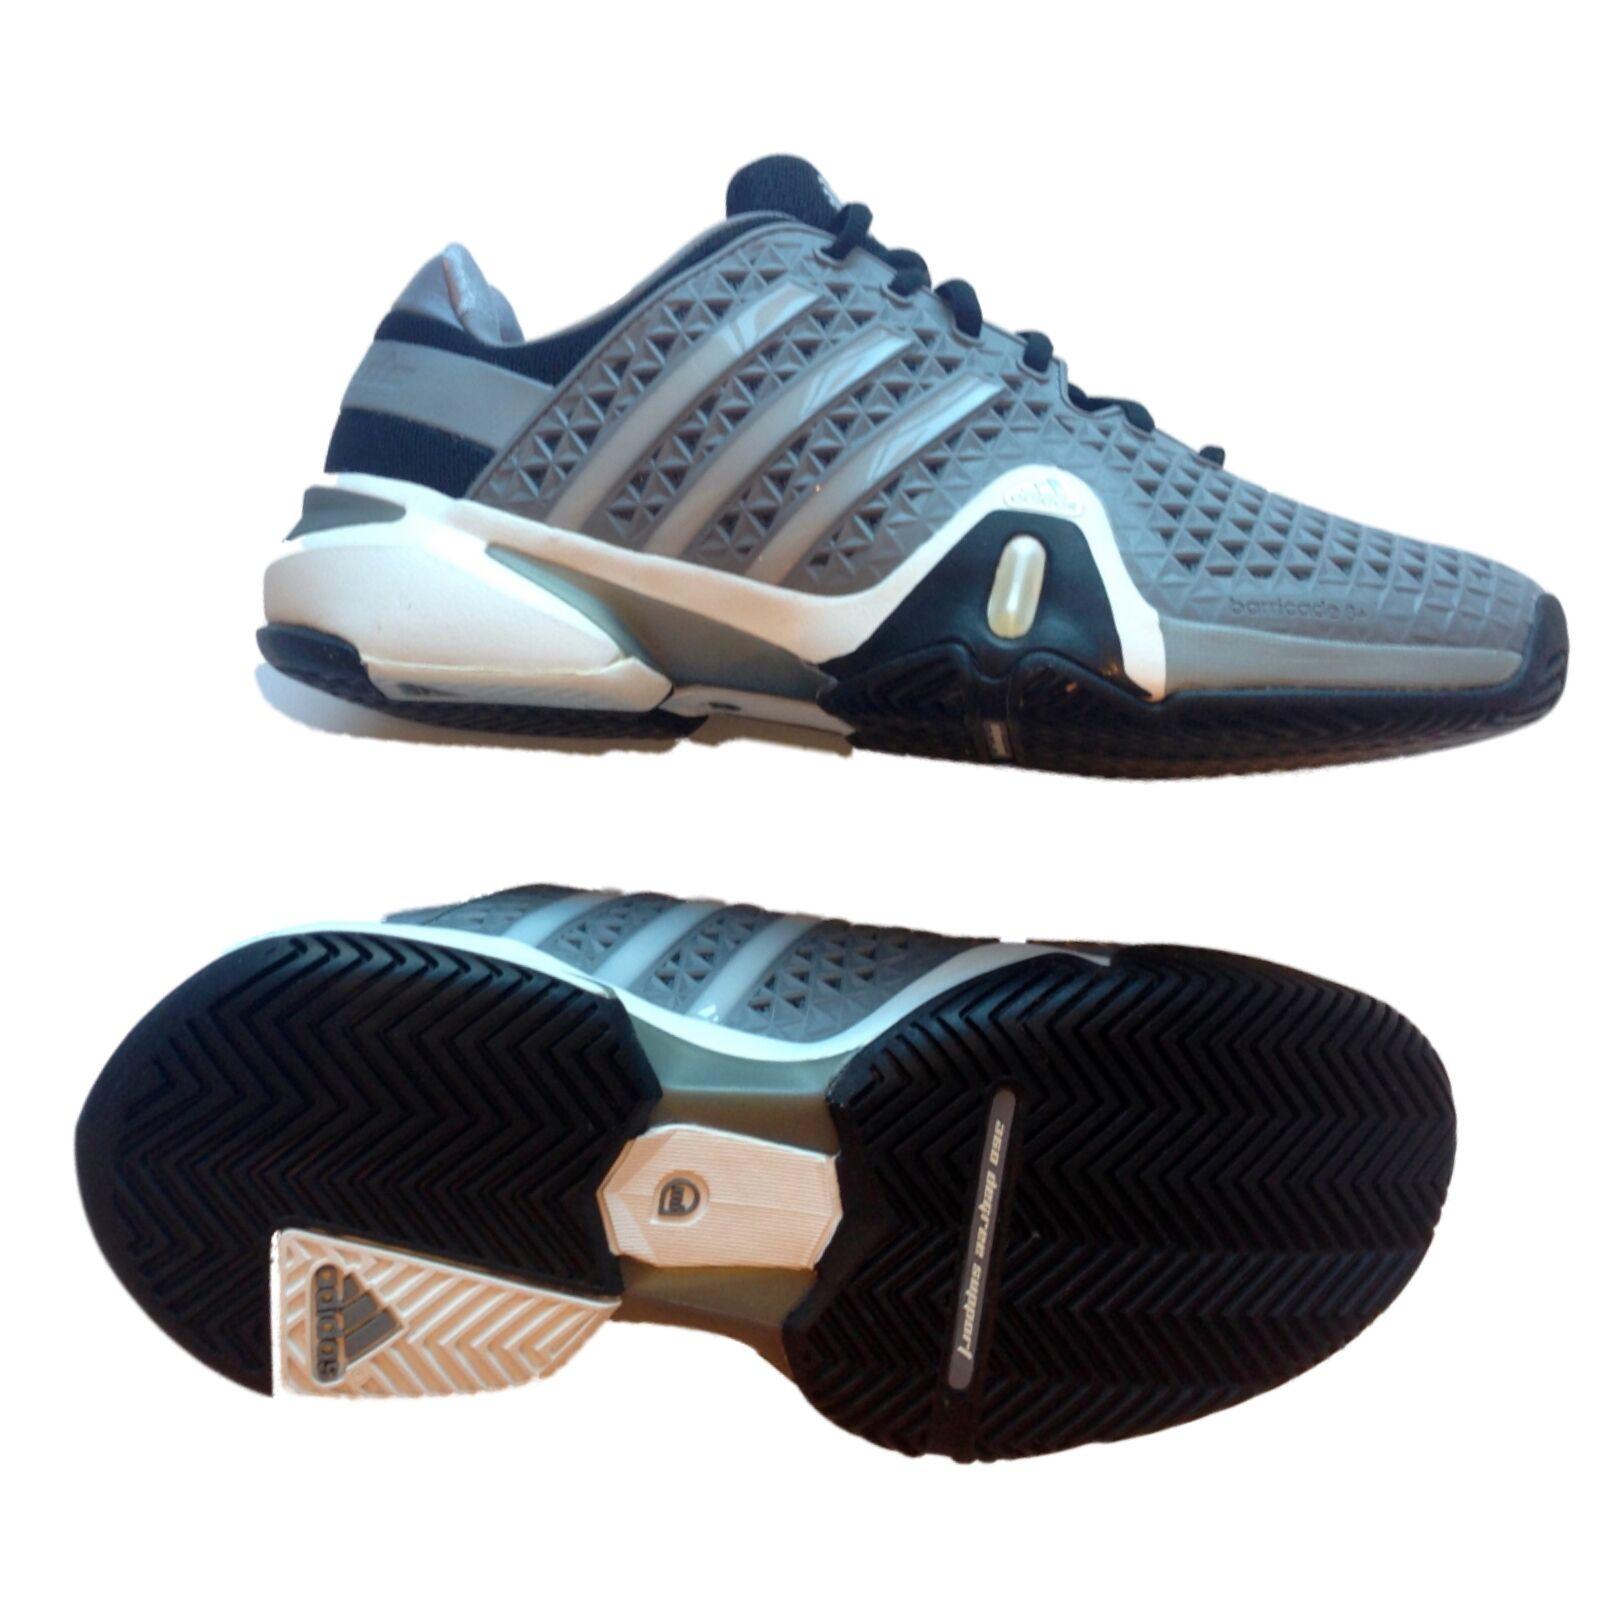 Adidas Sportschuhe Tennisschuhe adipower barricade 8+ Herren